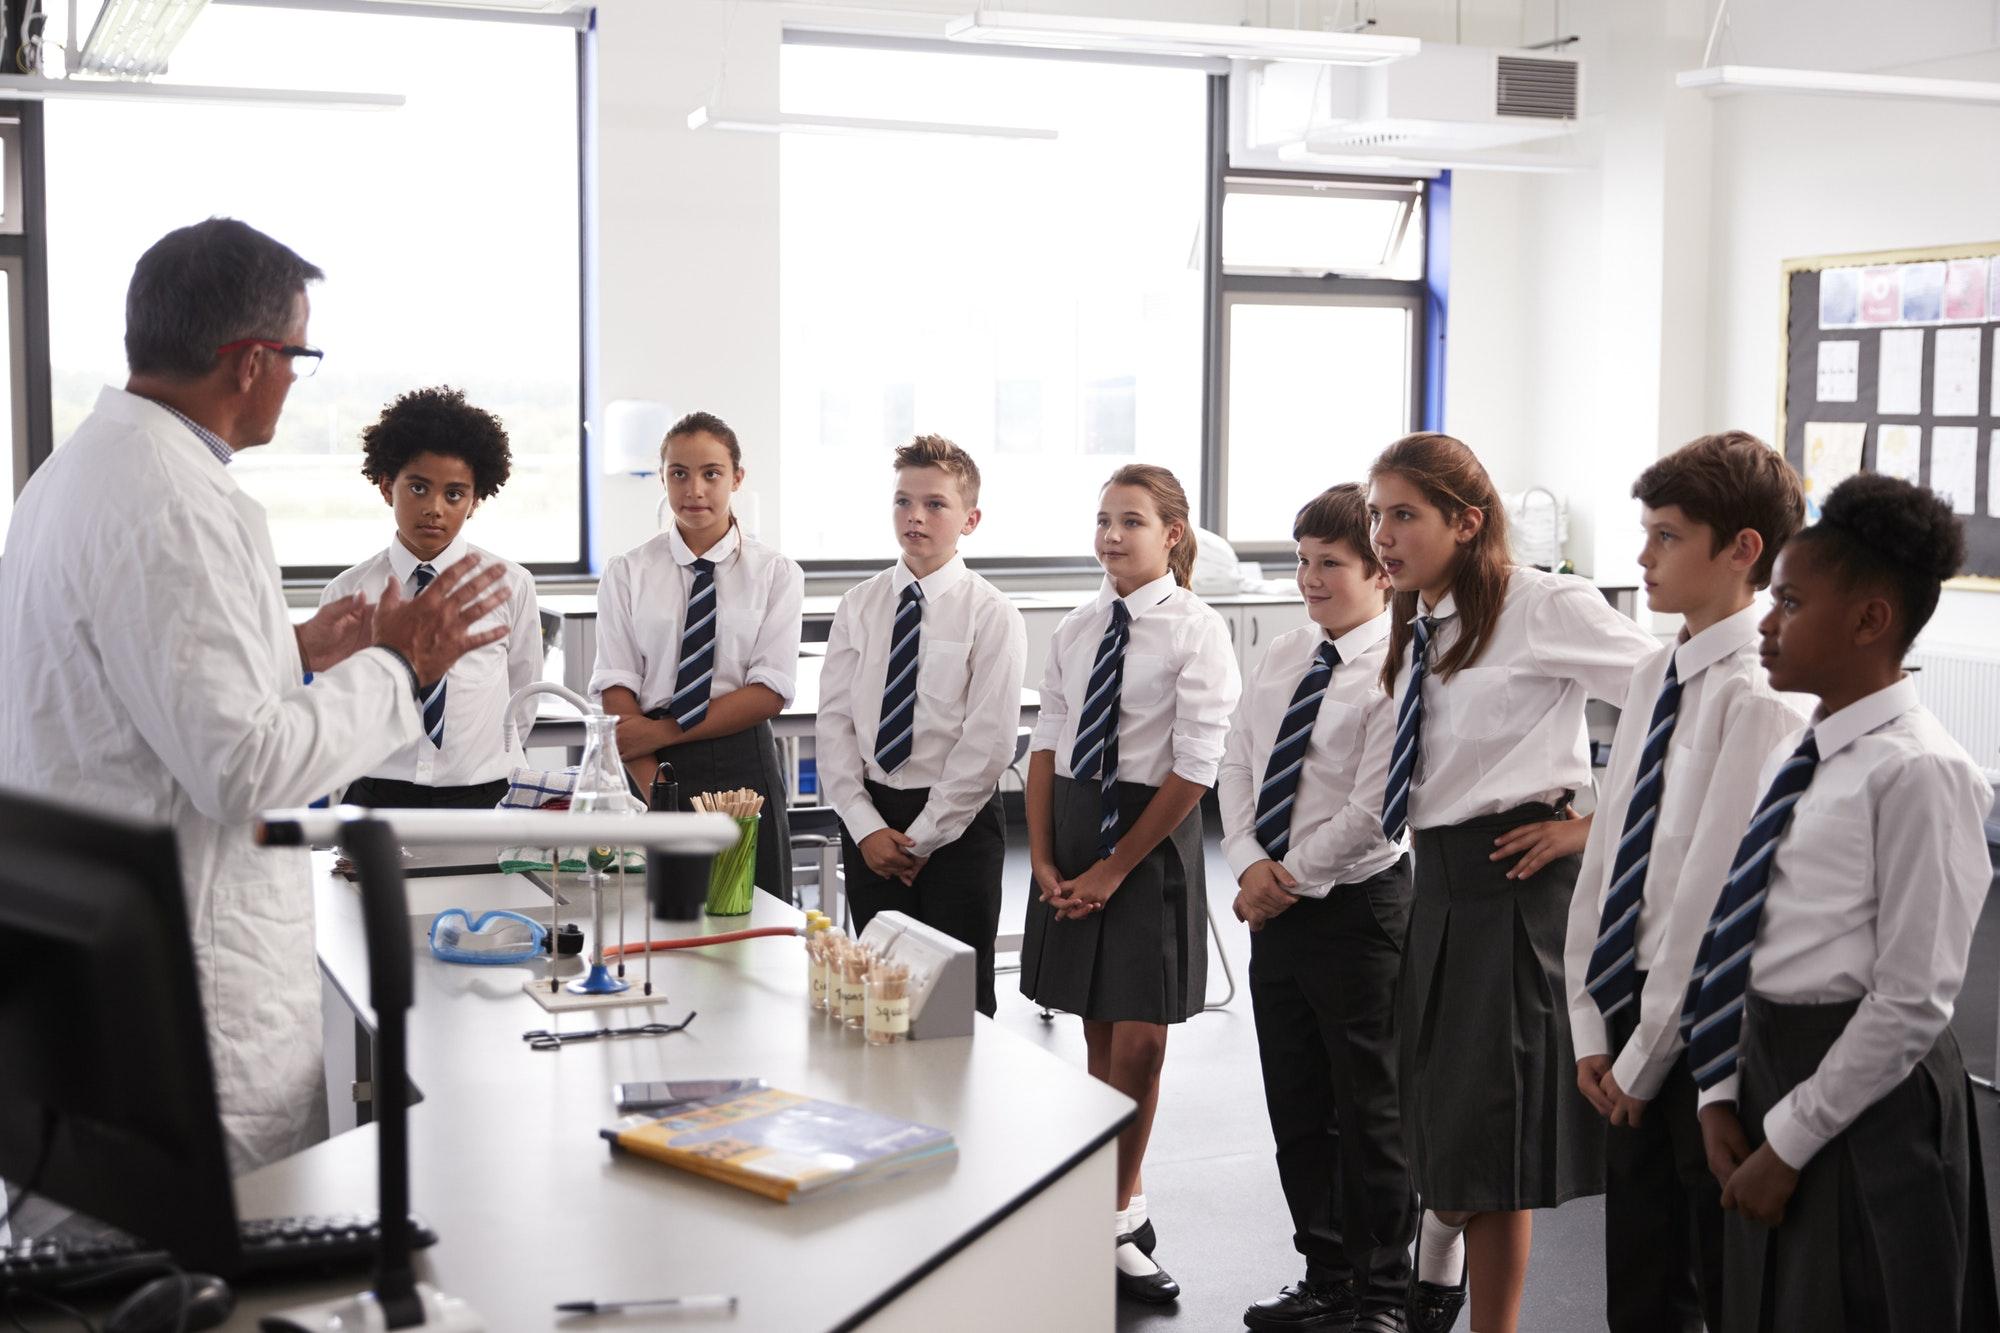 male-high-school-tutor-teaching-high-school-students-wearing-uniforms-in-science-class.jpg